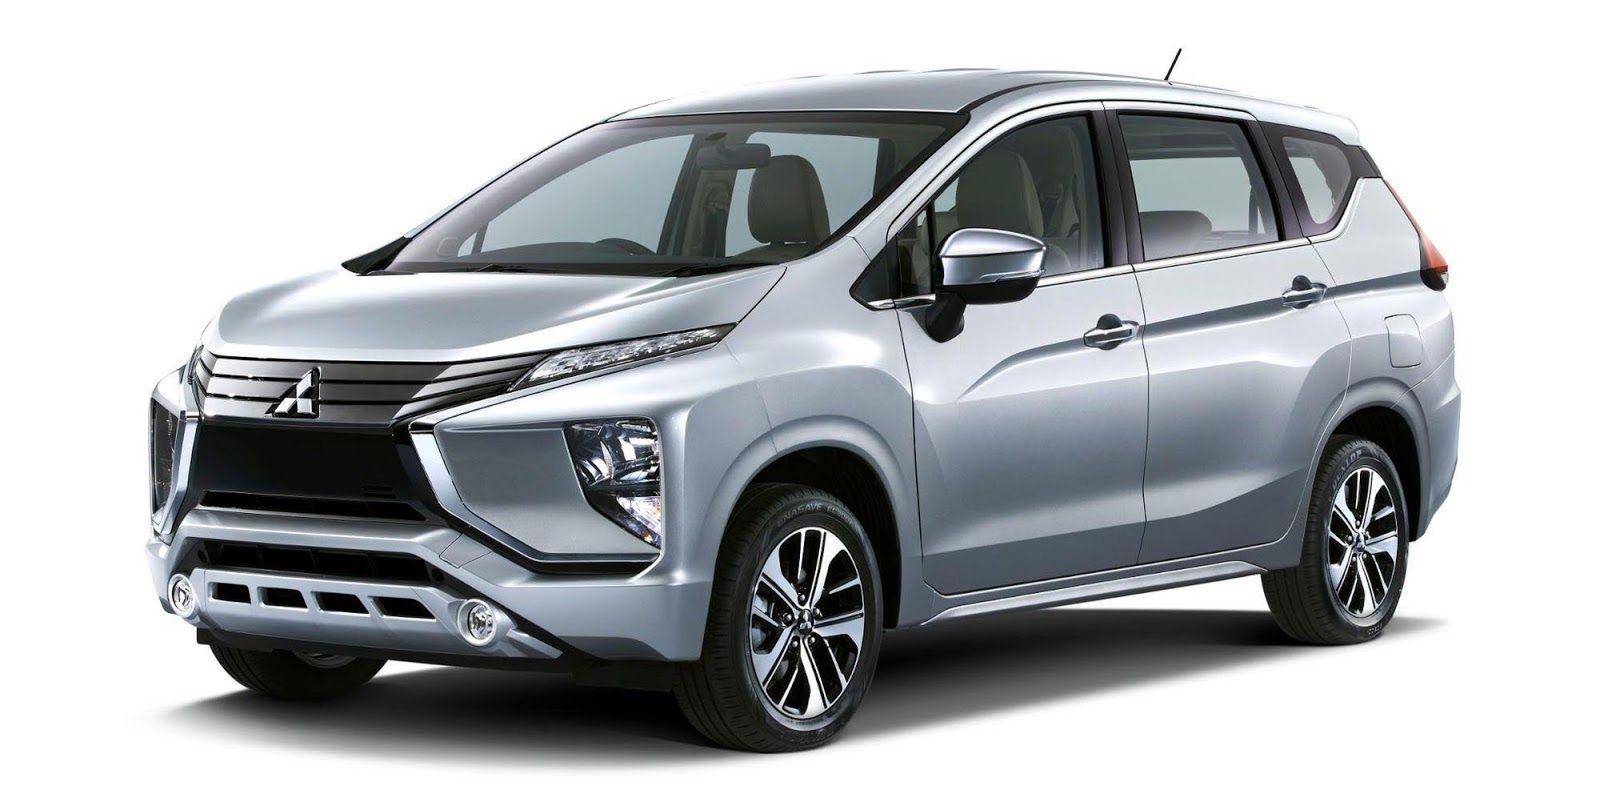 Harga Mitsubishi Expander 2 Jpg 1600 794 Mobil Mpv Mobil Toyota Camry